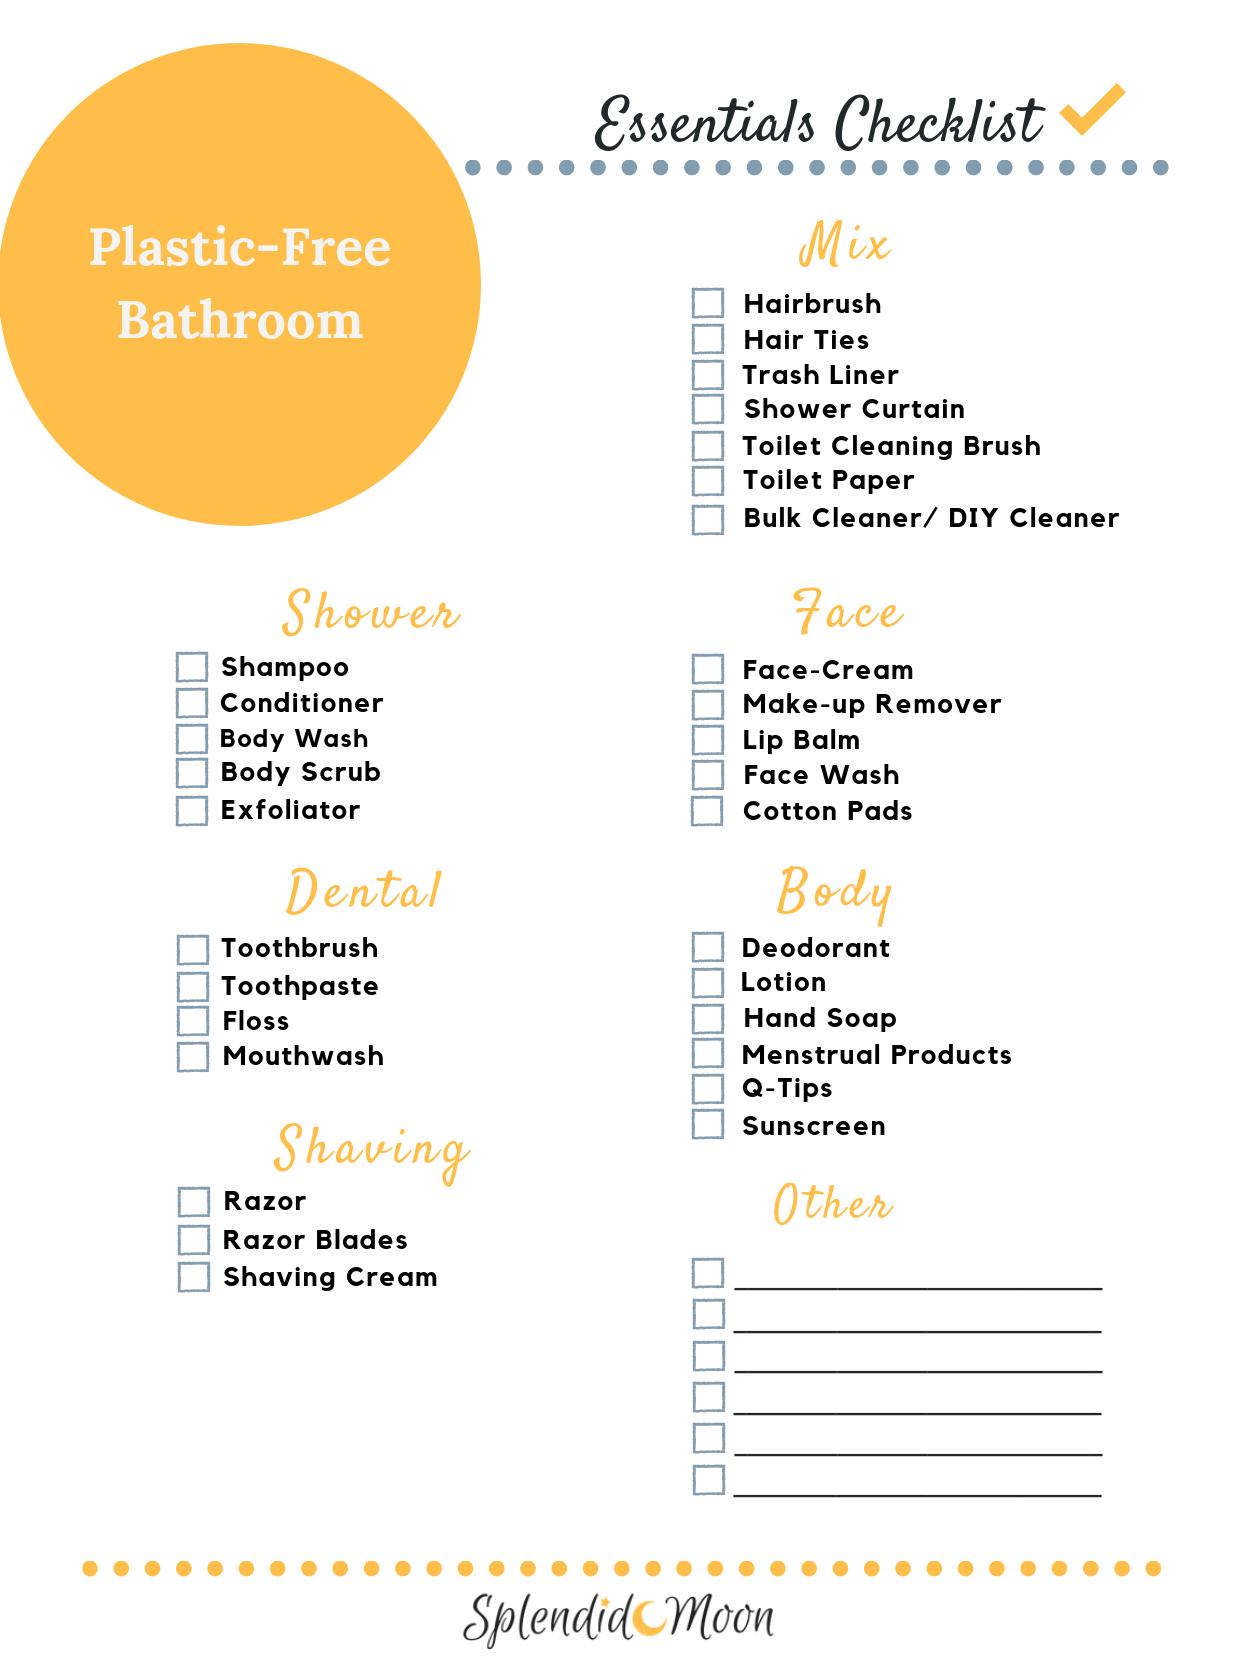 A Plastic Free Bathroom Essentials Checklist That Will